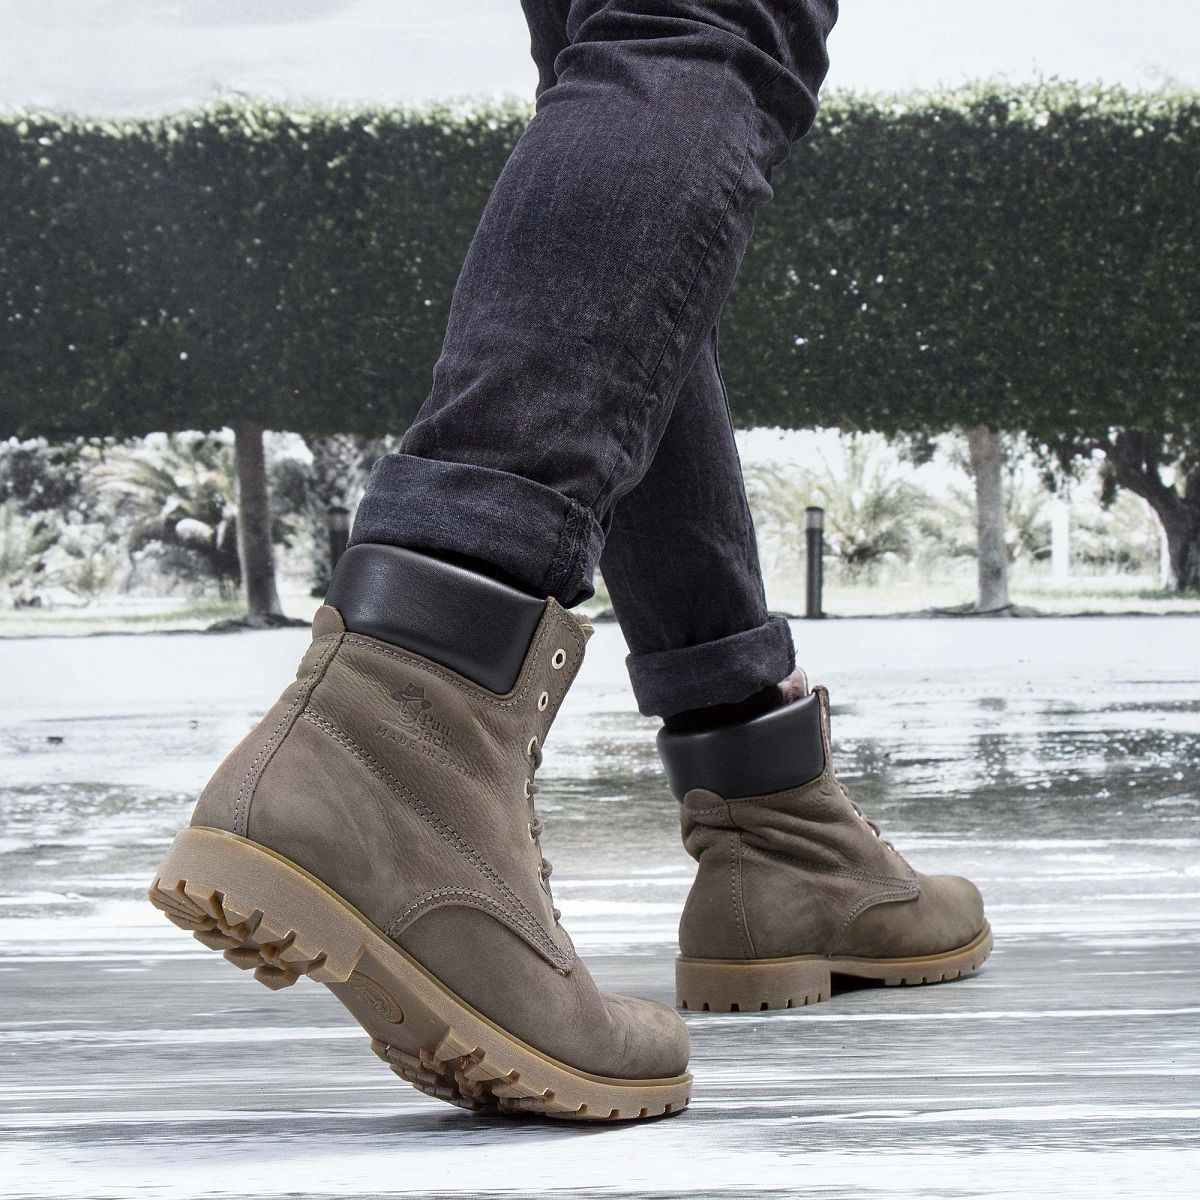 5a39c3e8473 Men's boot PANAMA 03 IGLOO grey | PANAMA JACK® Official store